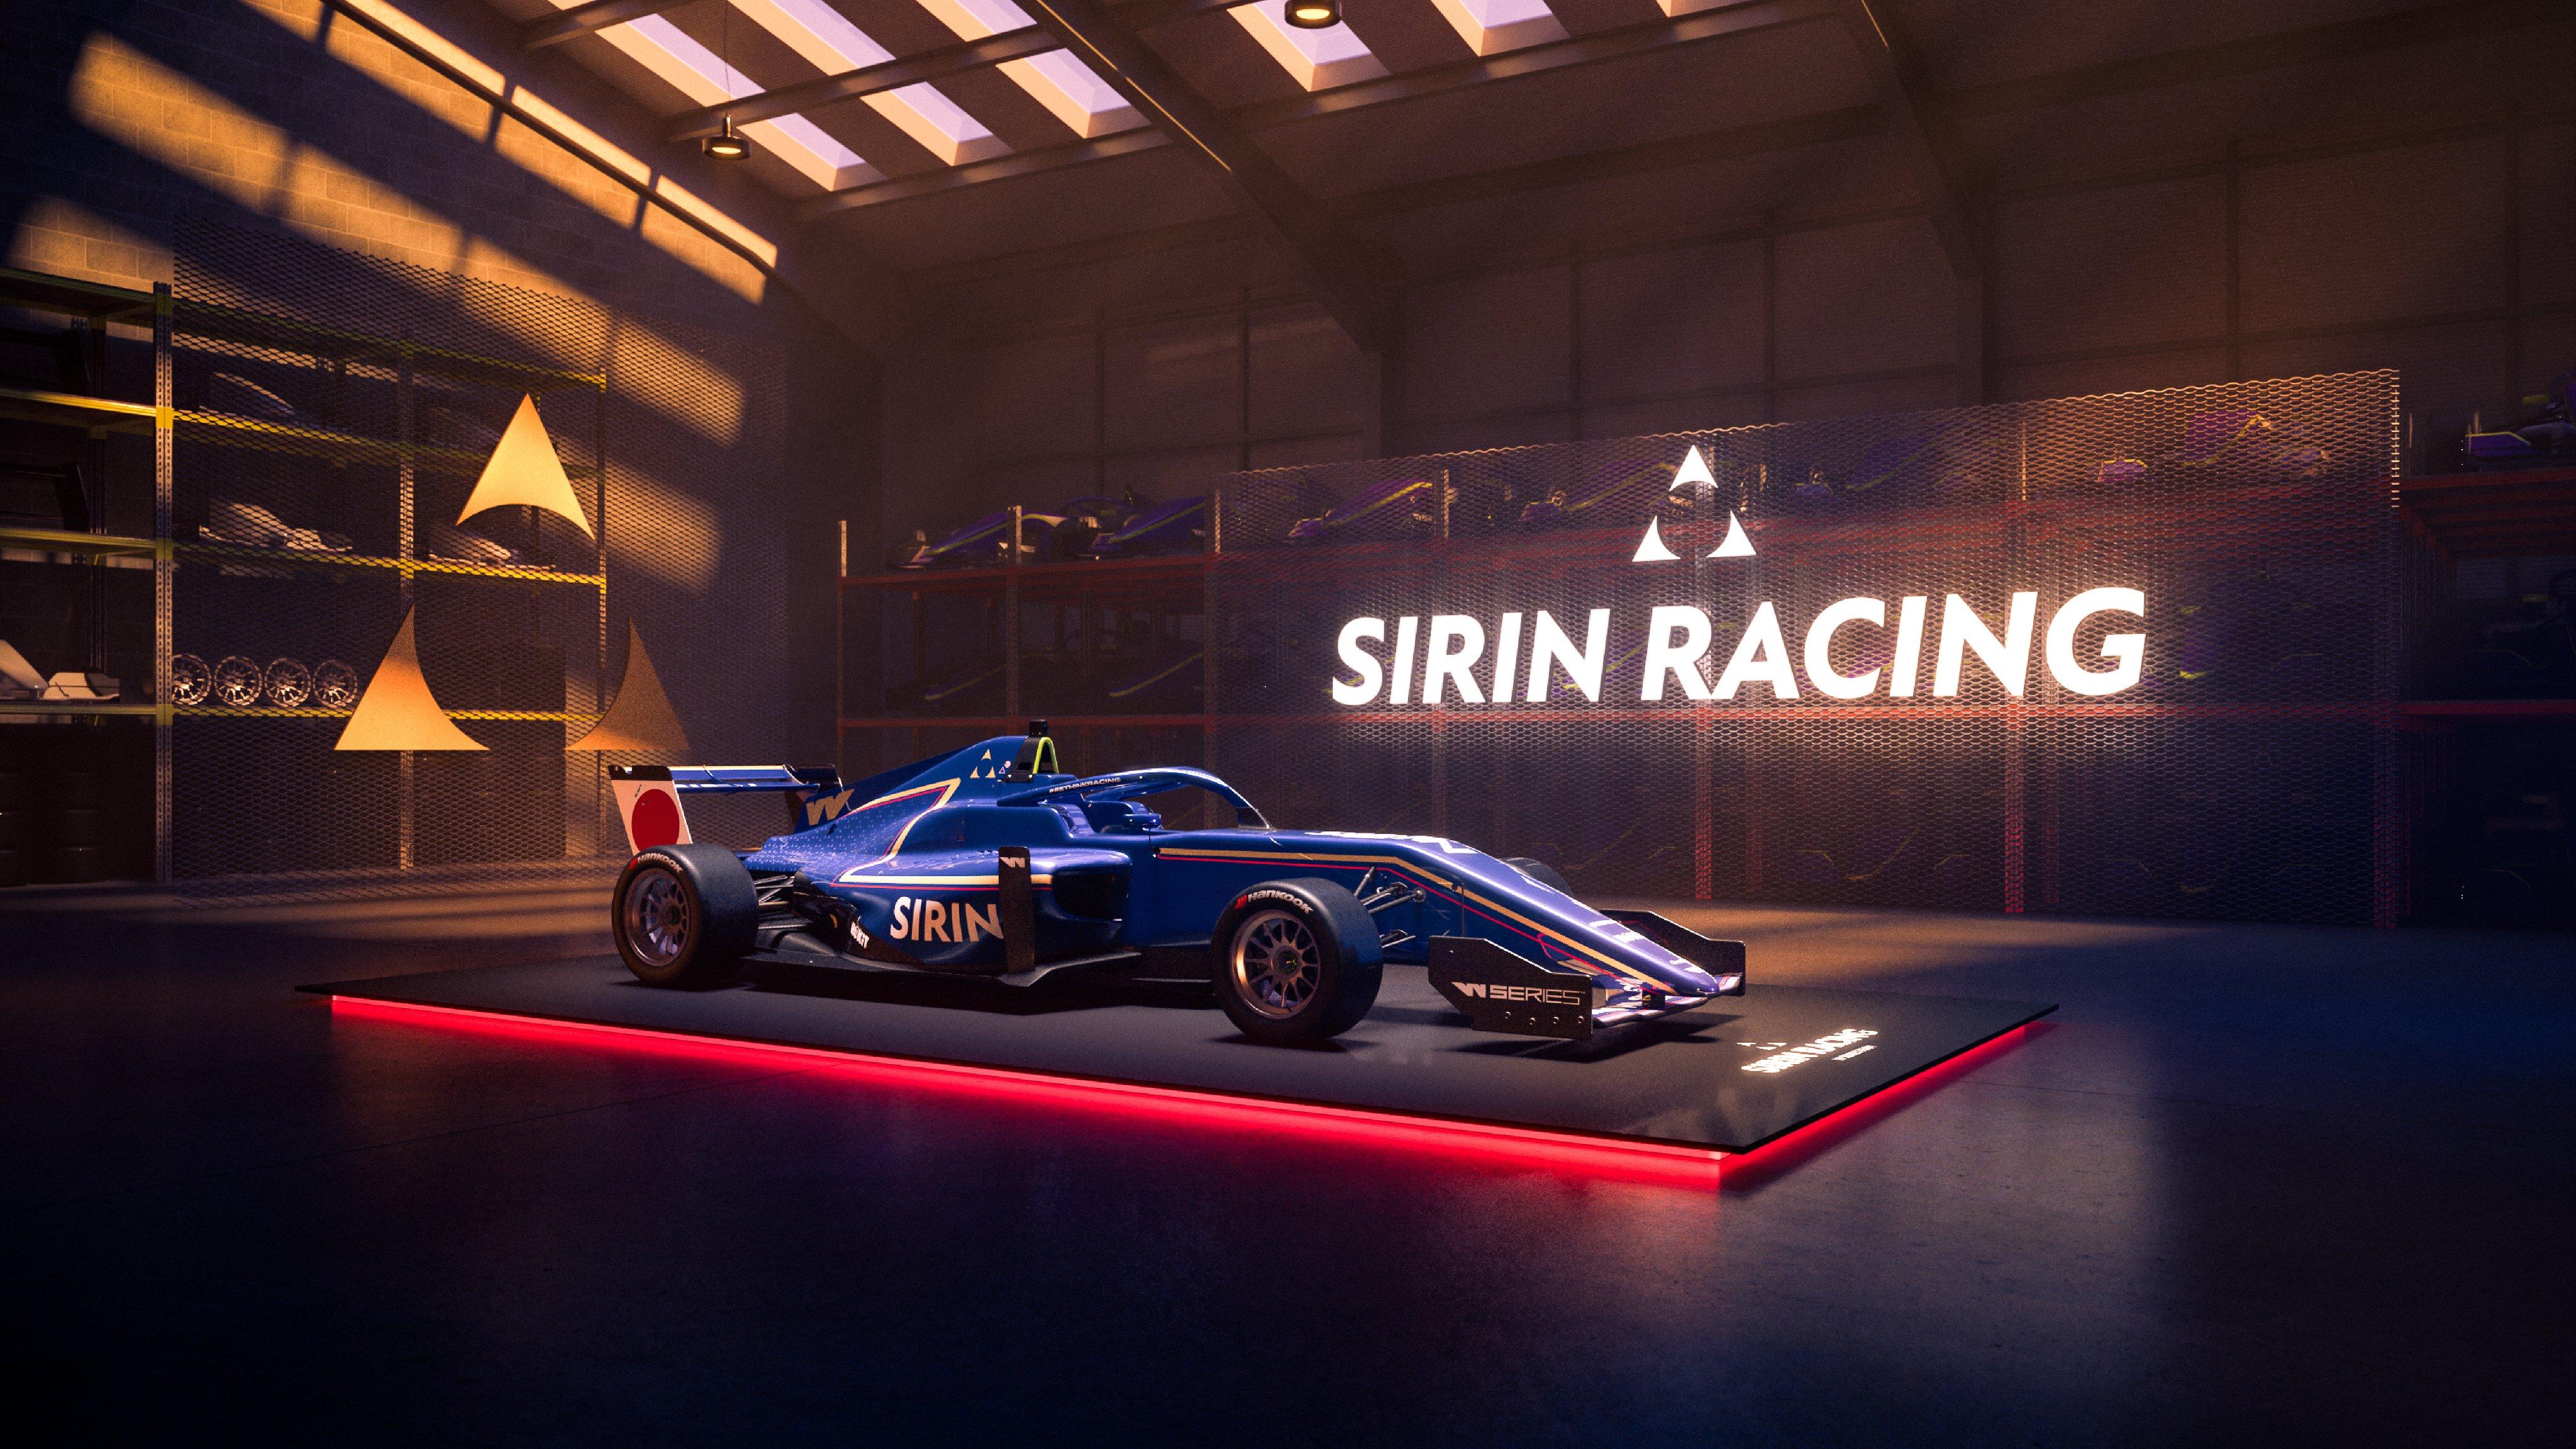 sirin-racing-w-series-soymotor.jpg